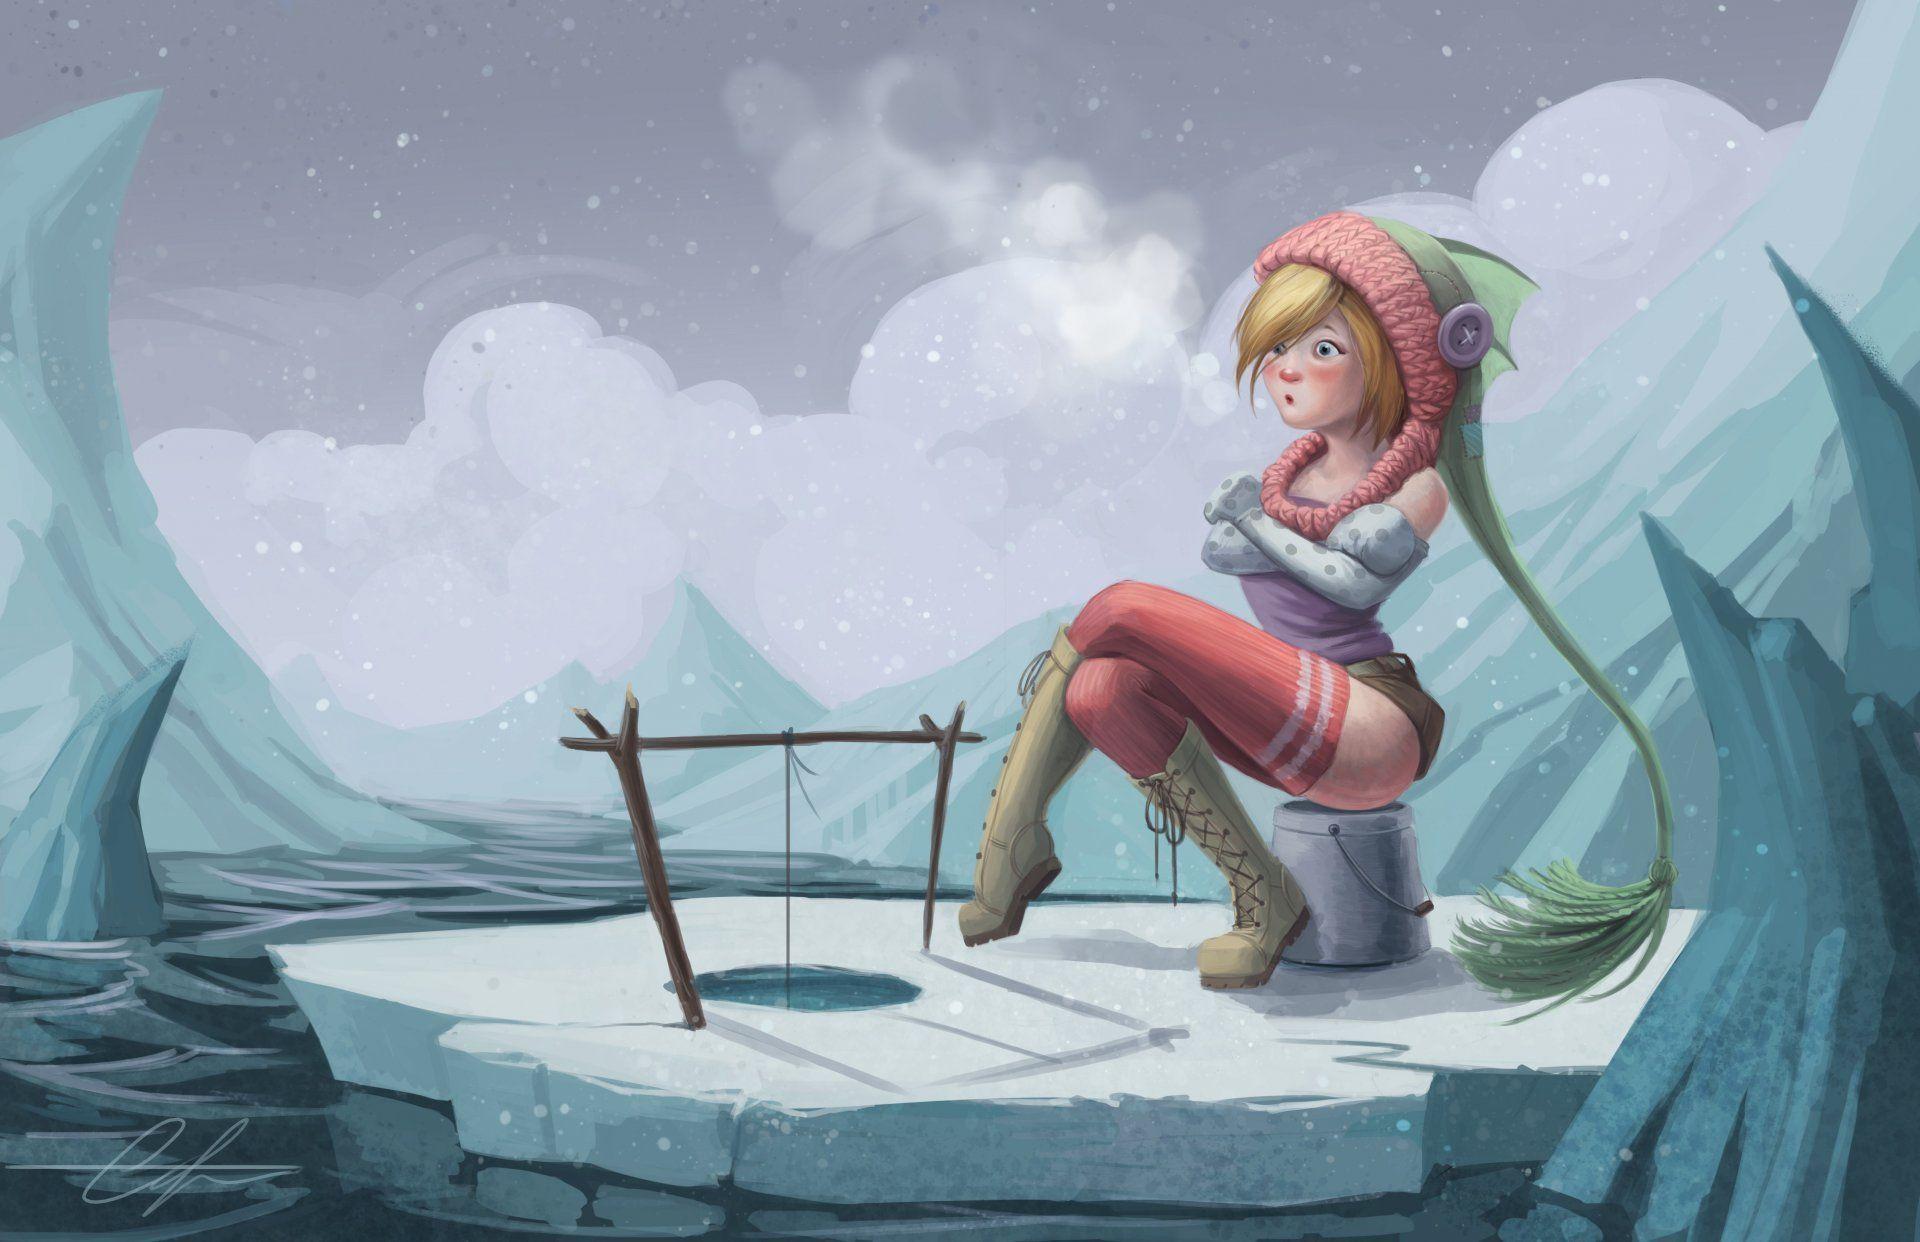 snaketoast girl frozen winter fishing do not bite snow ice floes